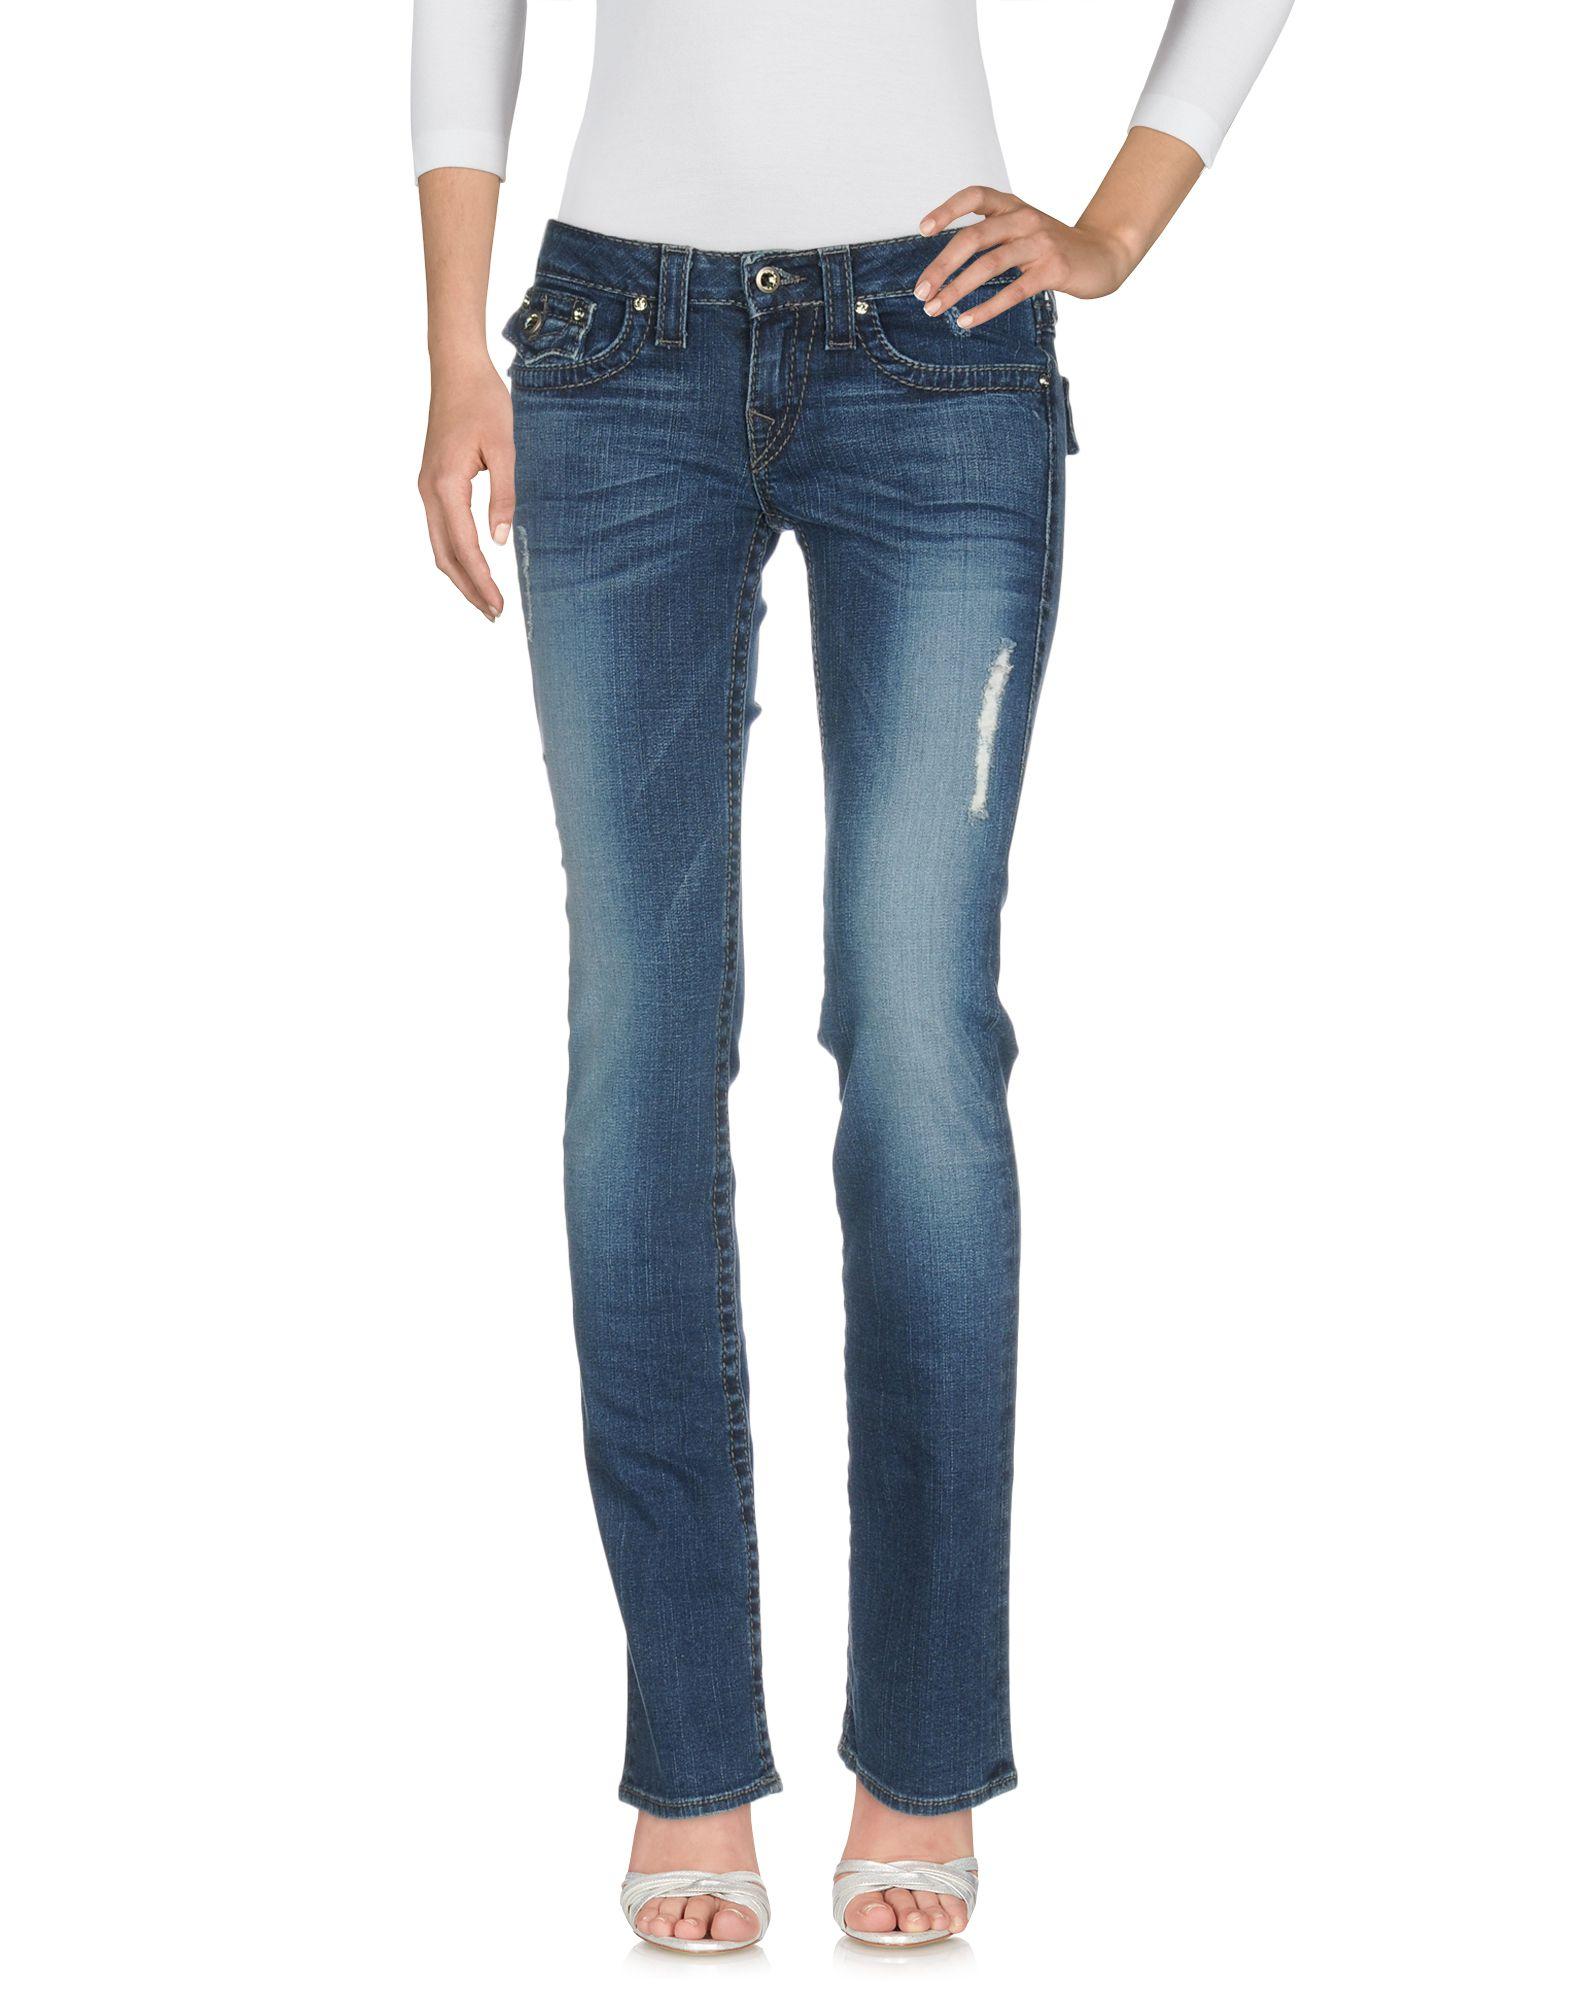 Pantaloni Jeans True Religion Donna - Acquista online su 3CFgrXJ